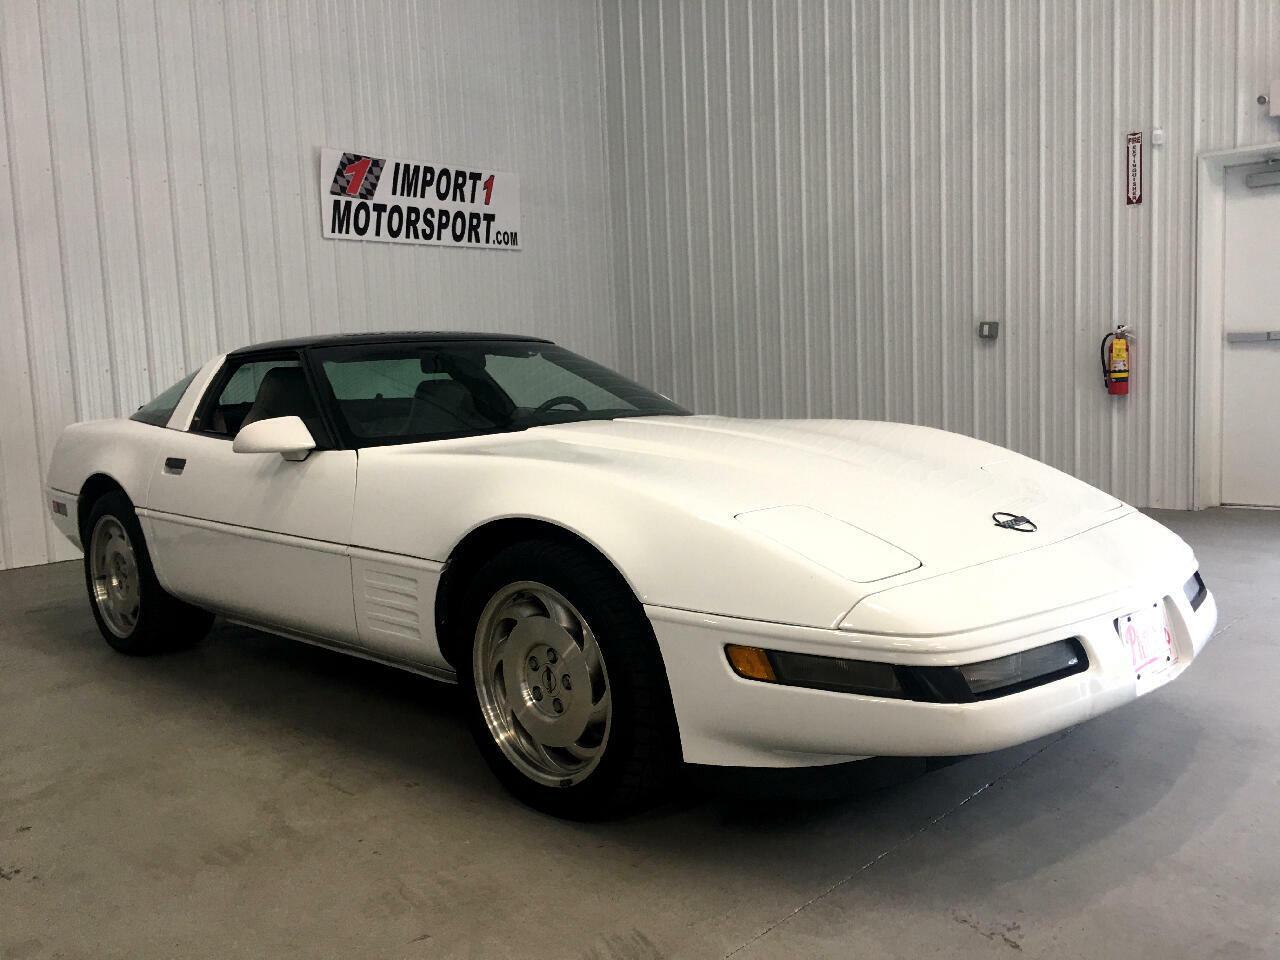 1994 White Chevrolet Corvette Coupe    C4 Corvette Photo 1